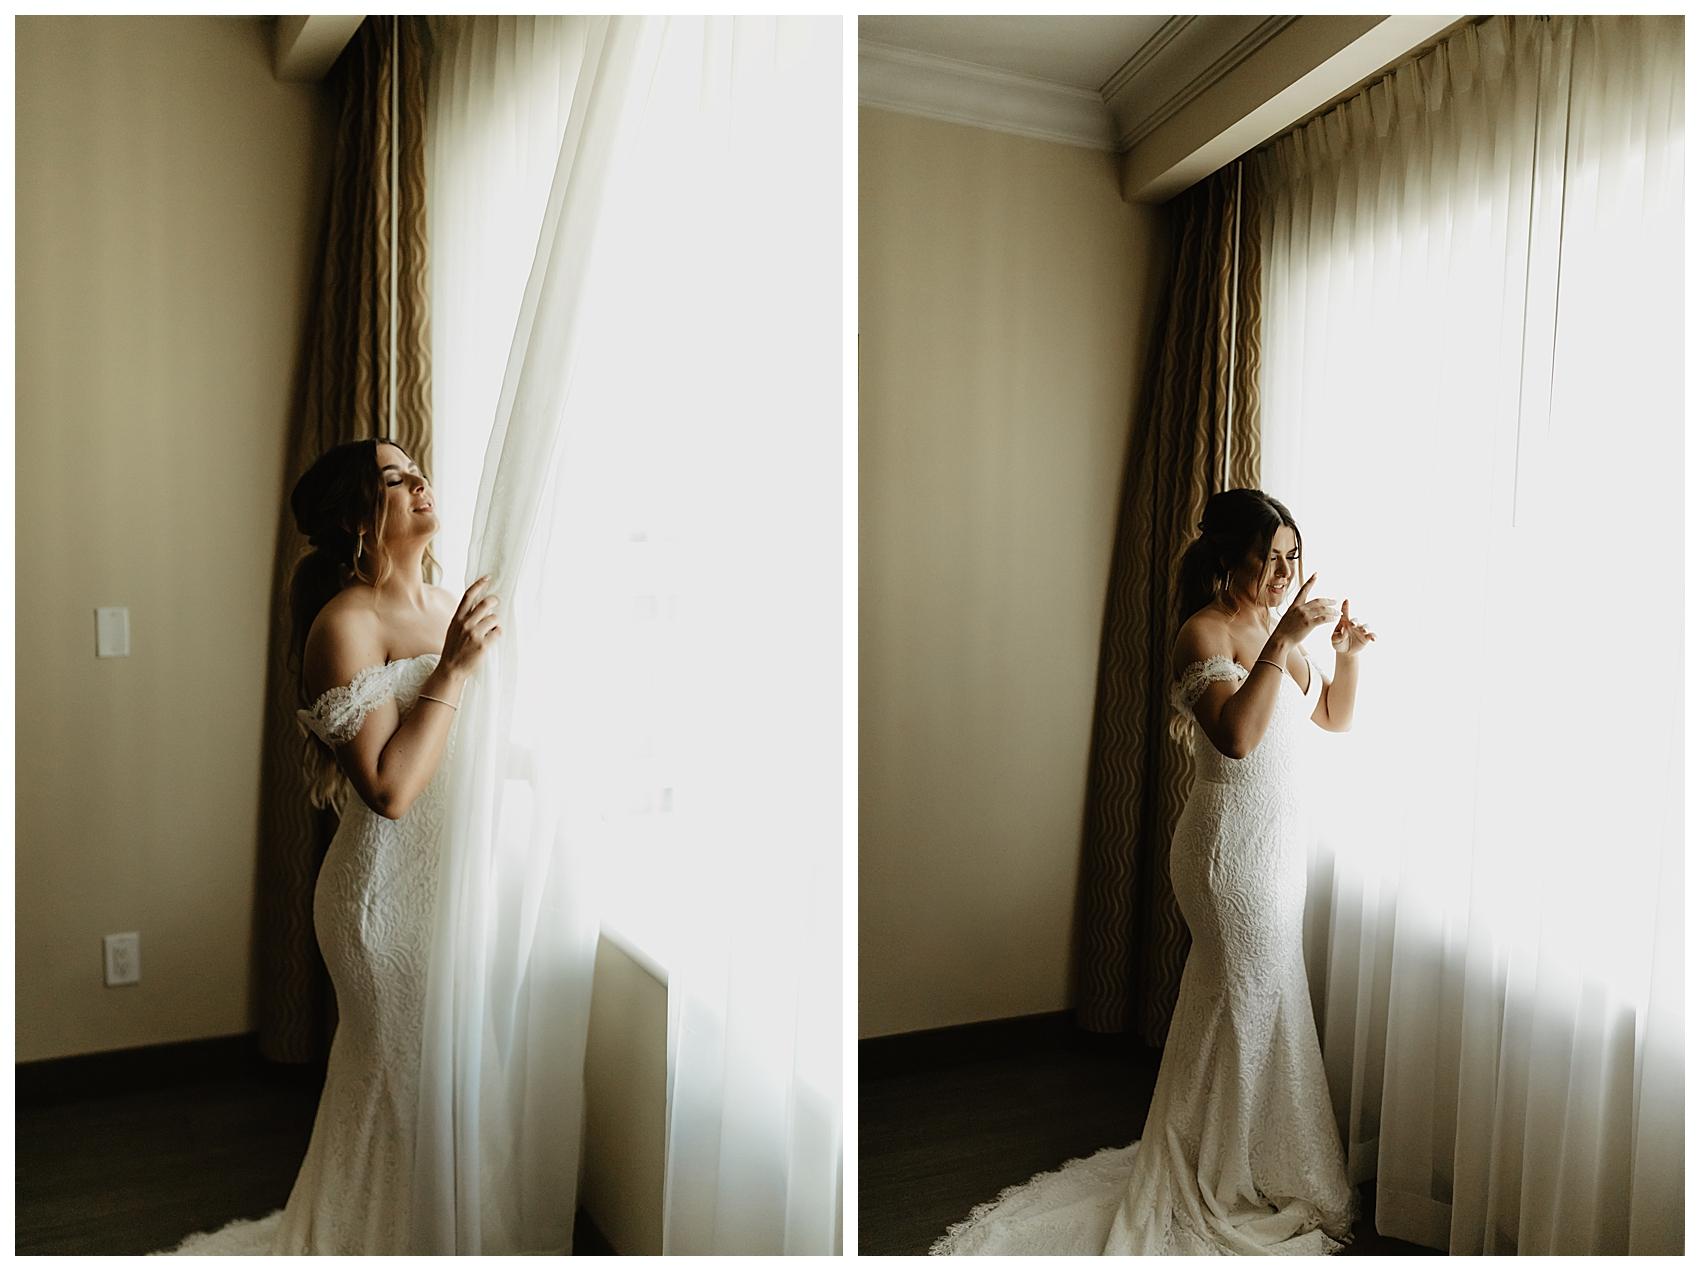 Chateau Rive Spokane Wedding Cassie Trottier Photography01019.jpg